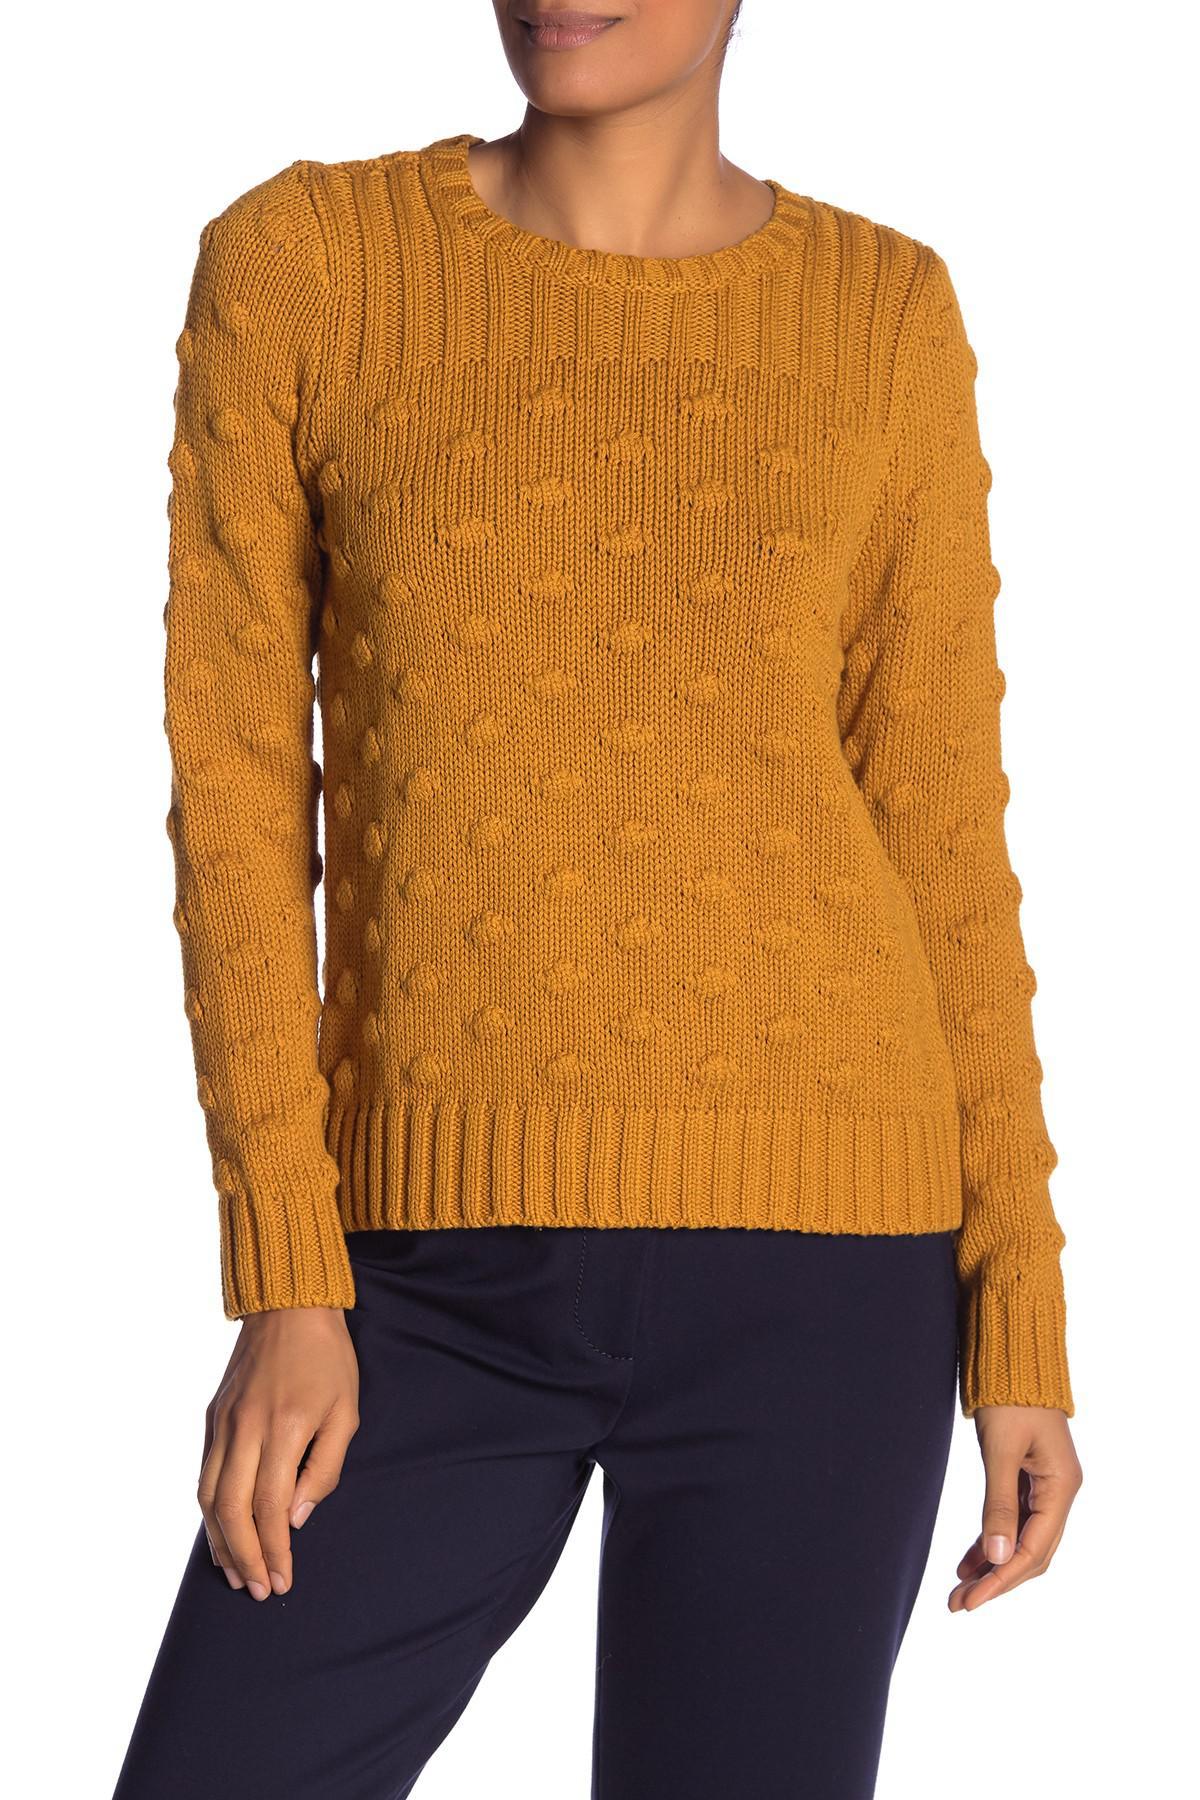 a8610955c3ee Lyst - Vince Camuto Vince Camto Popcorn Stitch Cotton Sweater in Orange